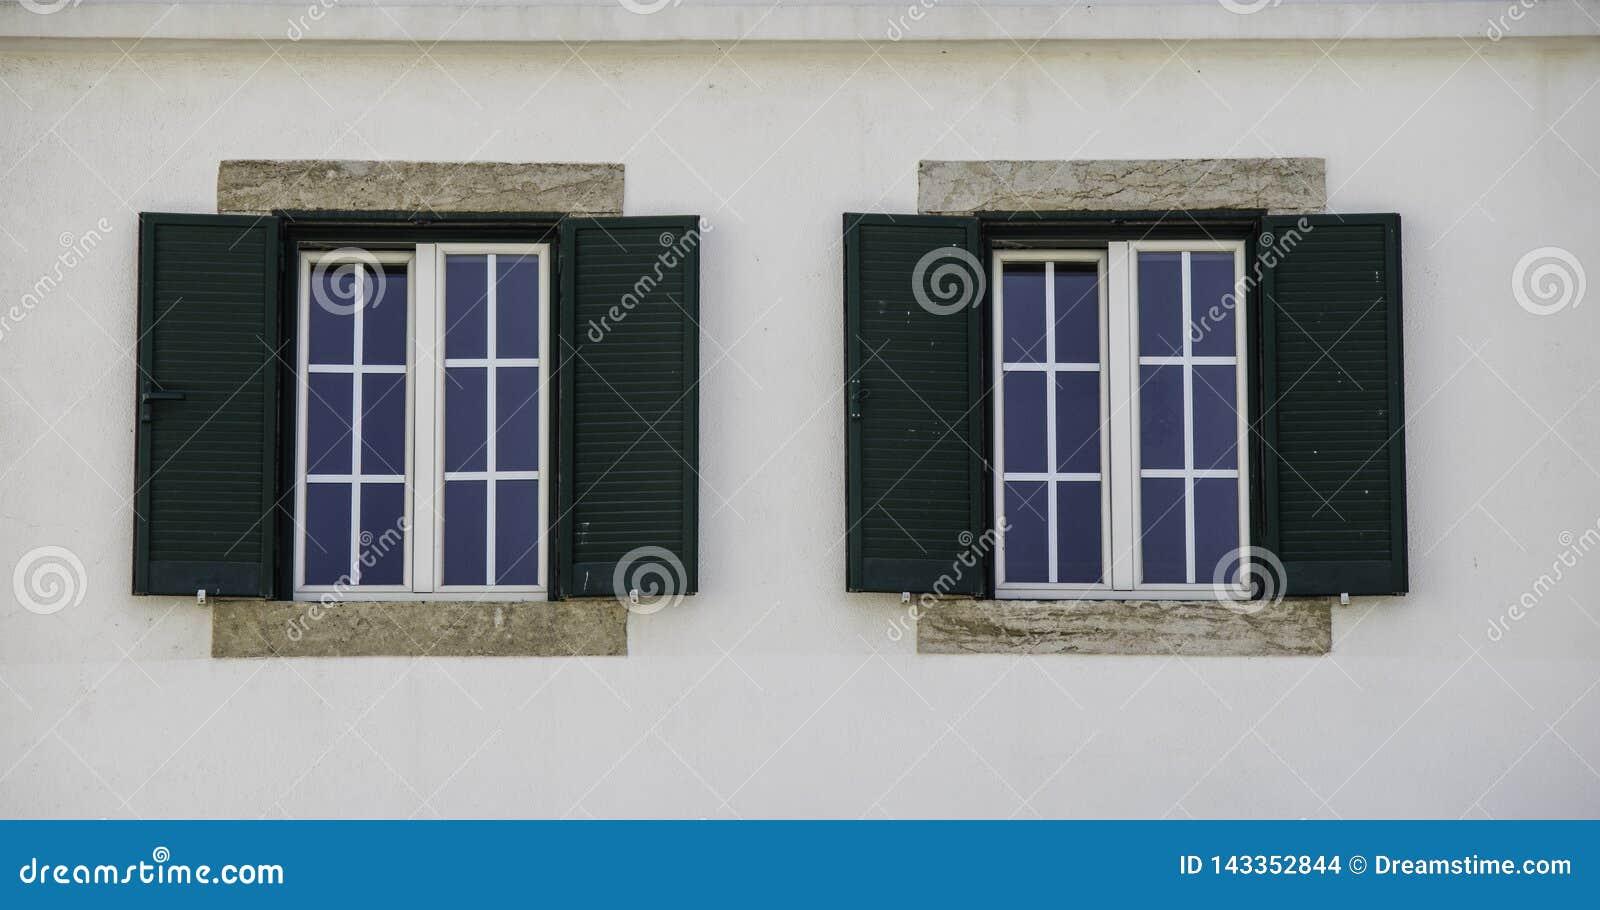 Architektur dwoiści okno w Europa